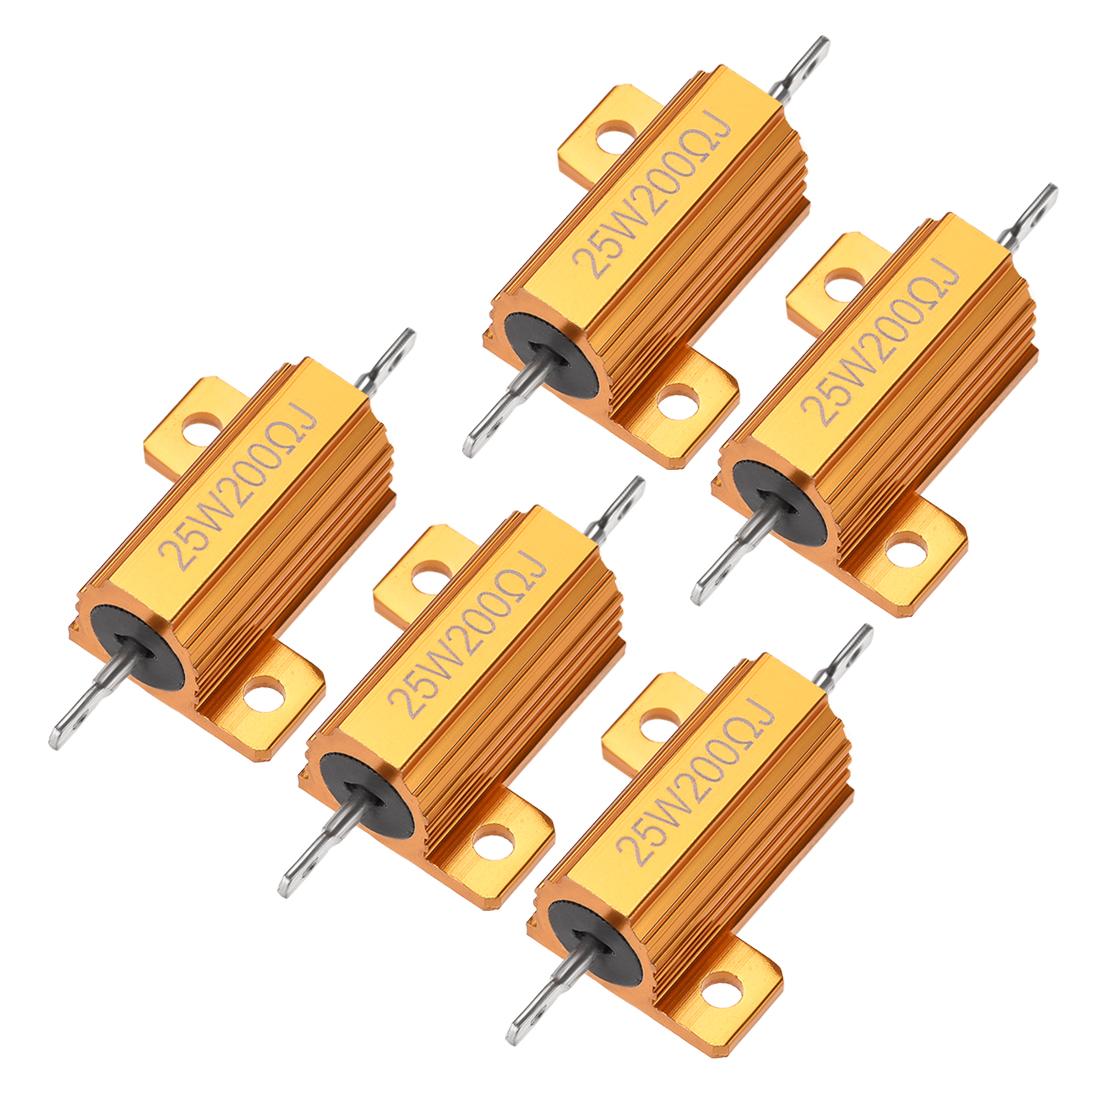 25W 200 Ohm 5% Aluminum Housing Resistor Wirewound Resistor Gold Tone 5 Pcs